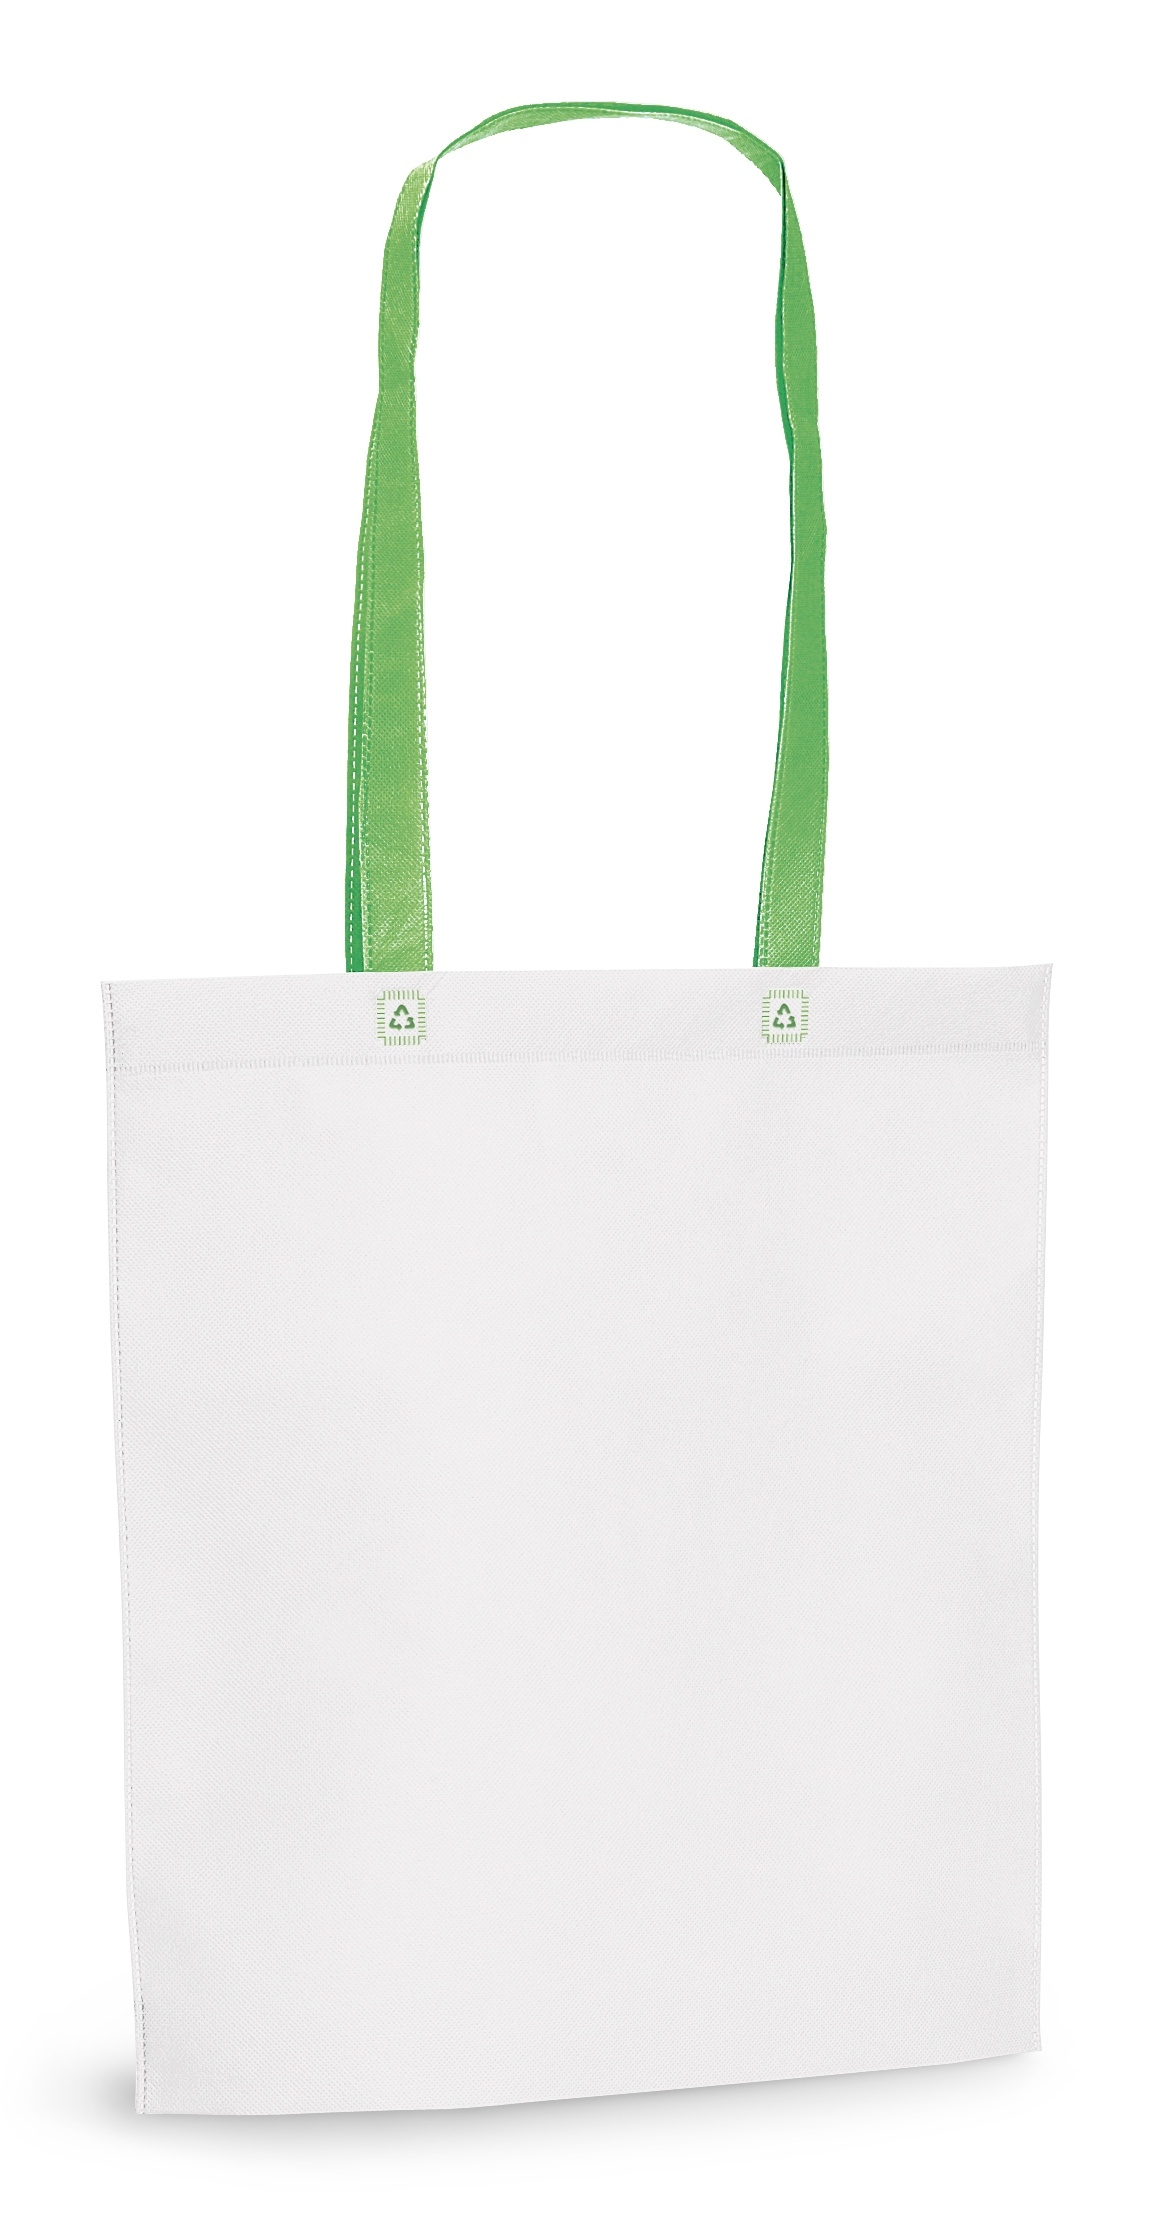 Senara Re-usable Bag Product Code GP92832